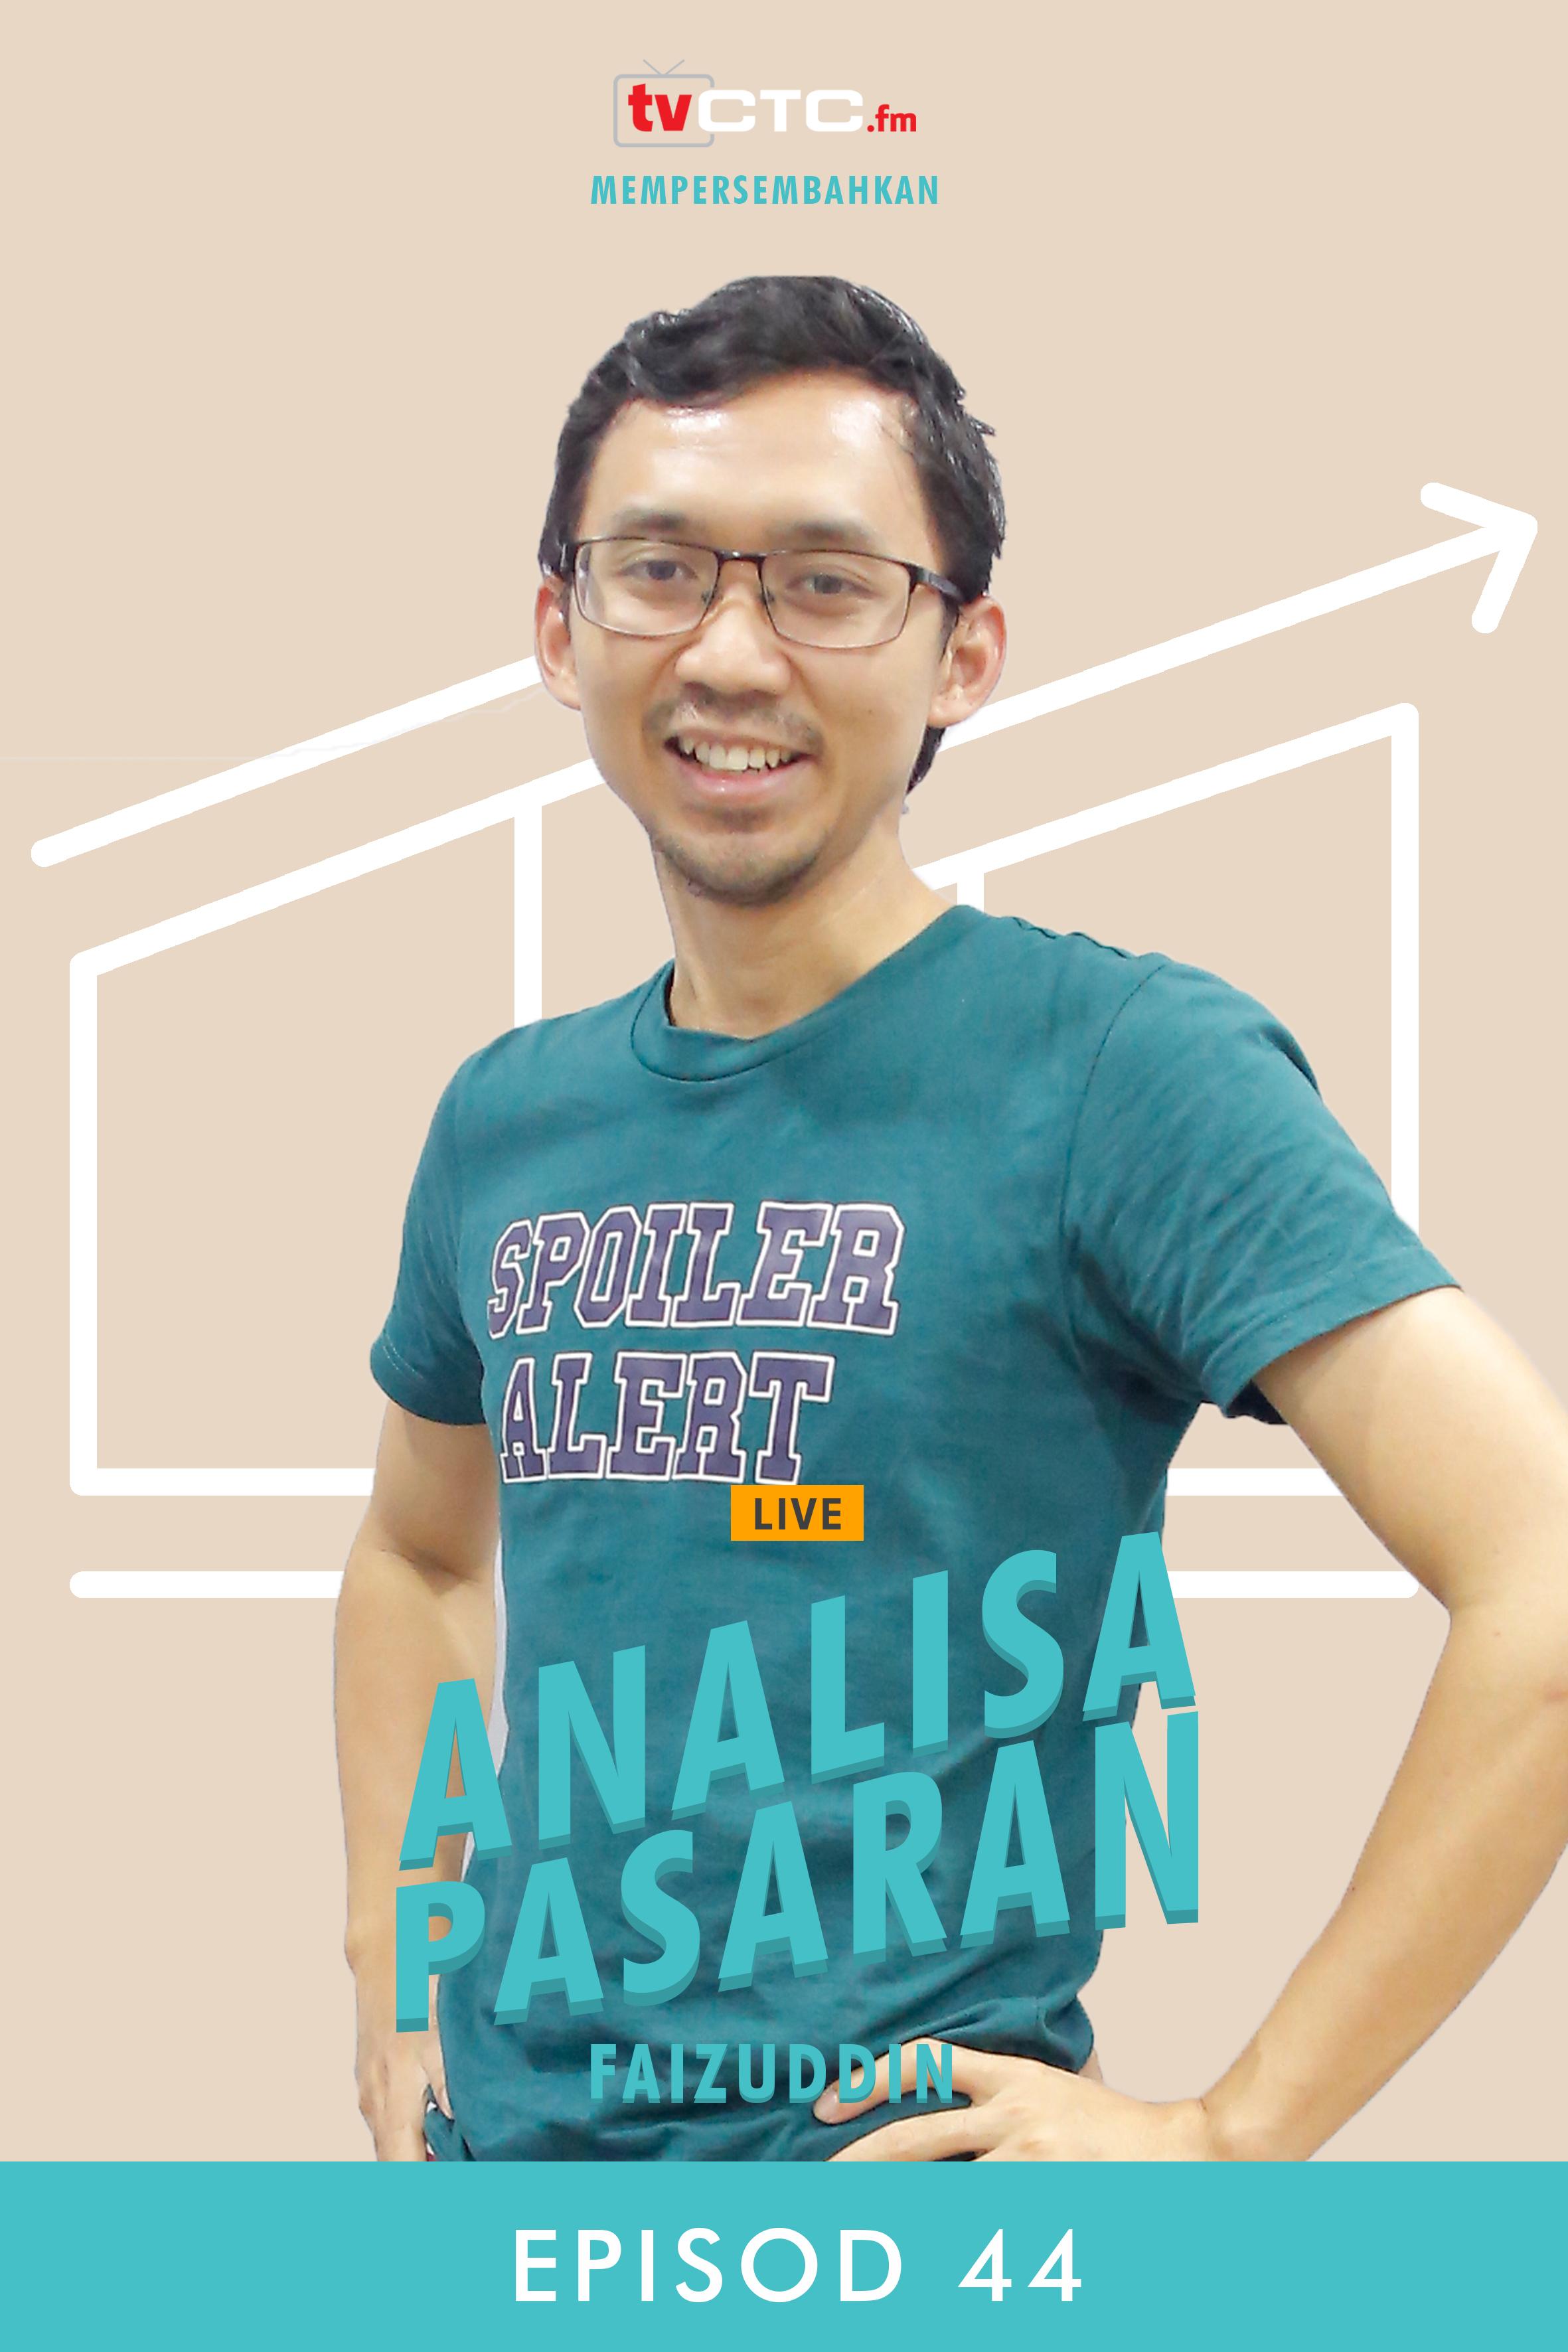 ANALISA PASARAN : Faizuddin (Episod 44)